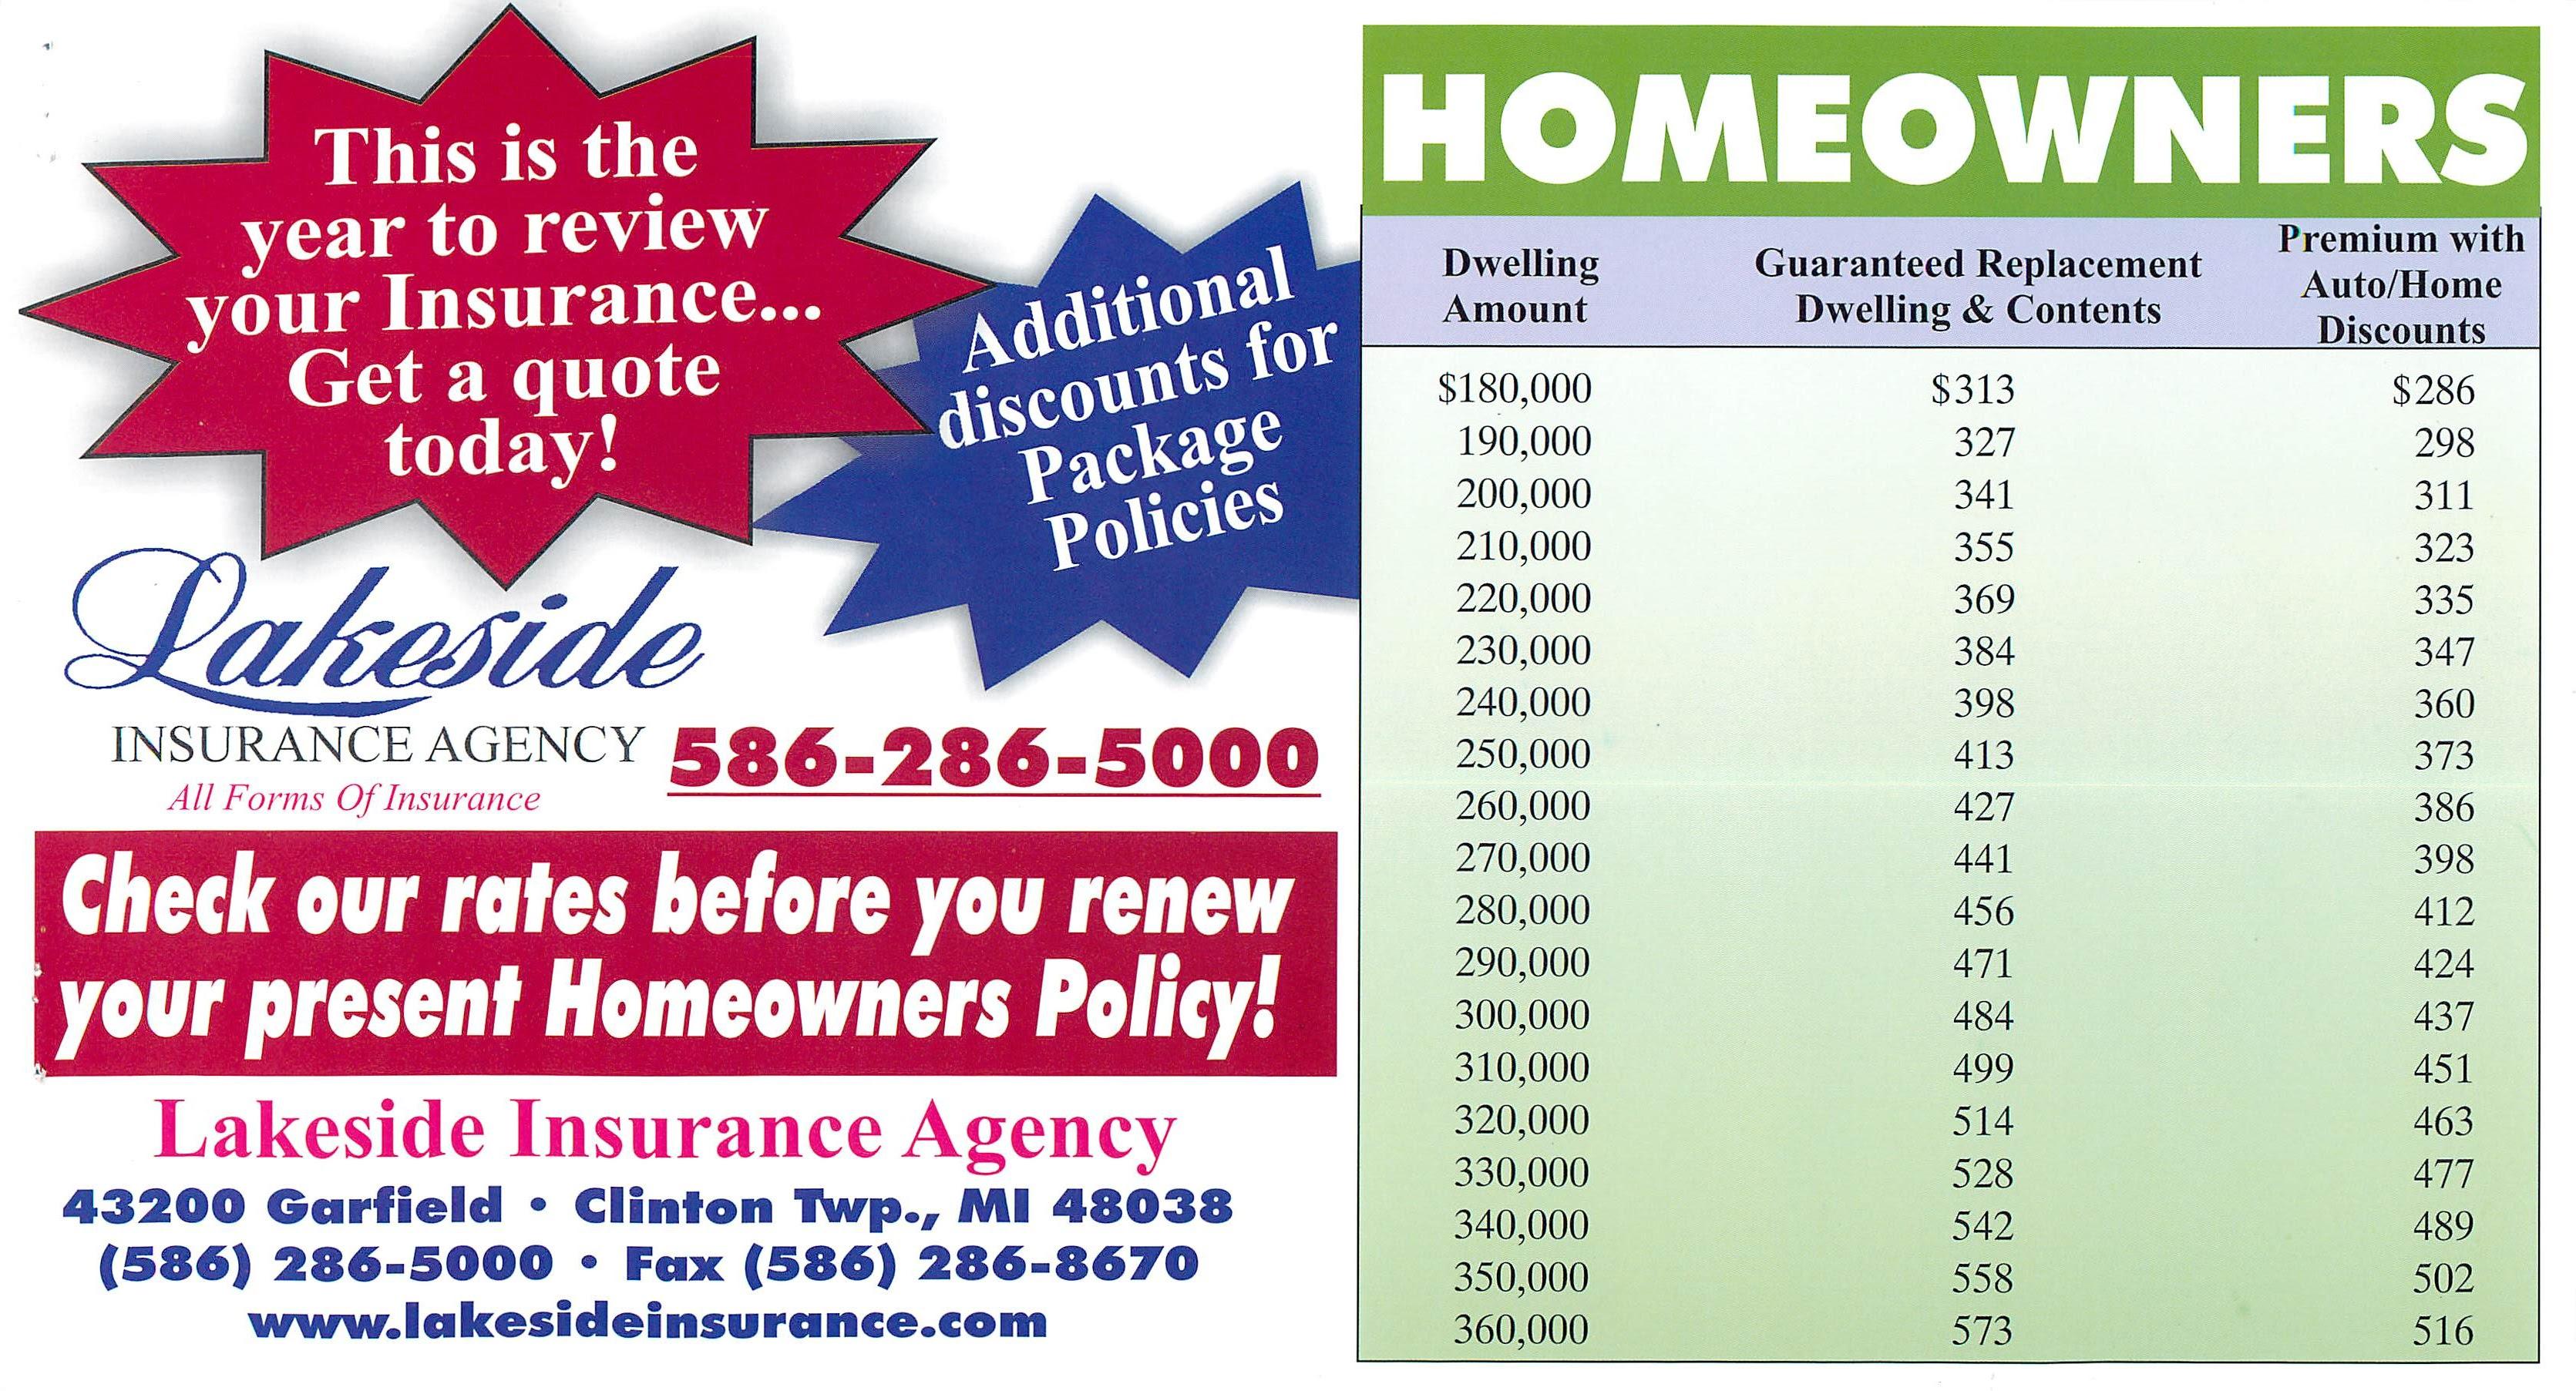 canonprintermx410: 25 Images Auto Home Insurance Quotes Online